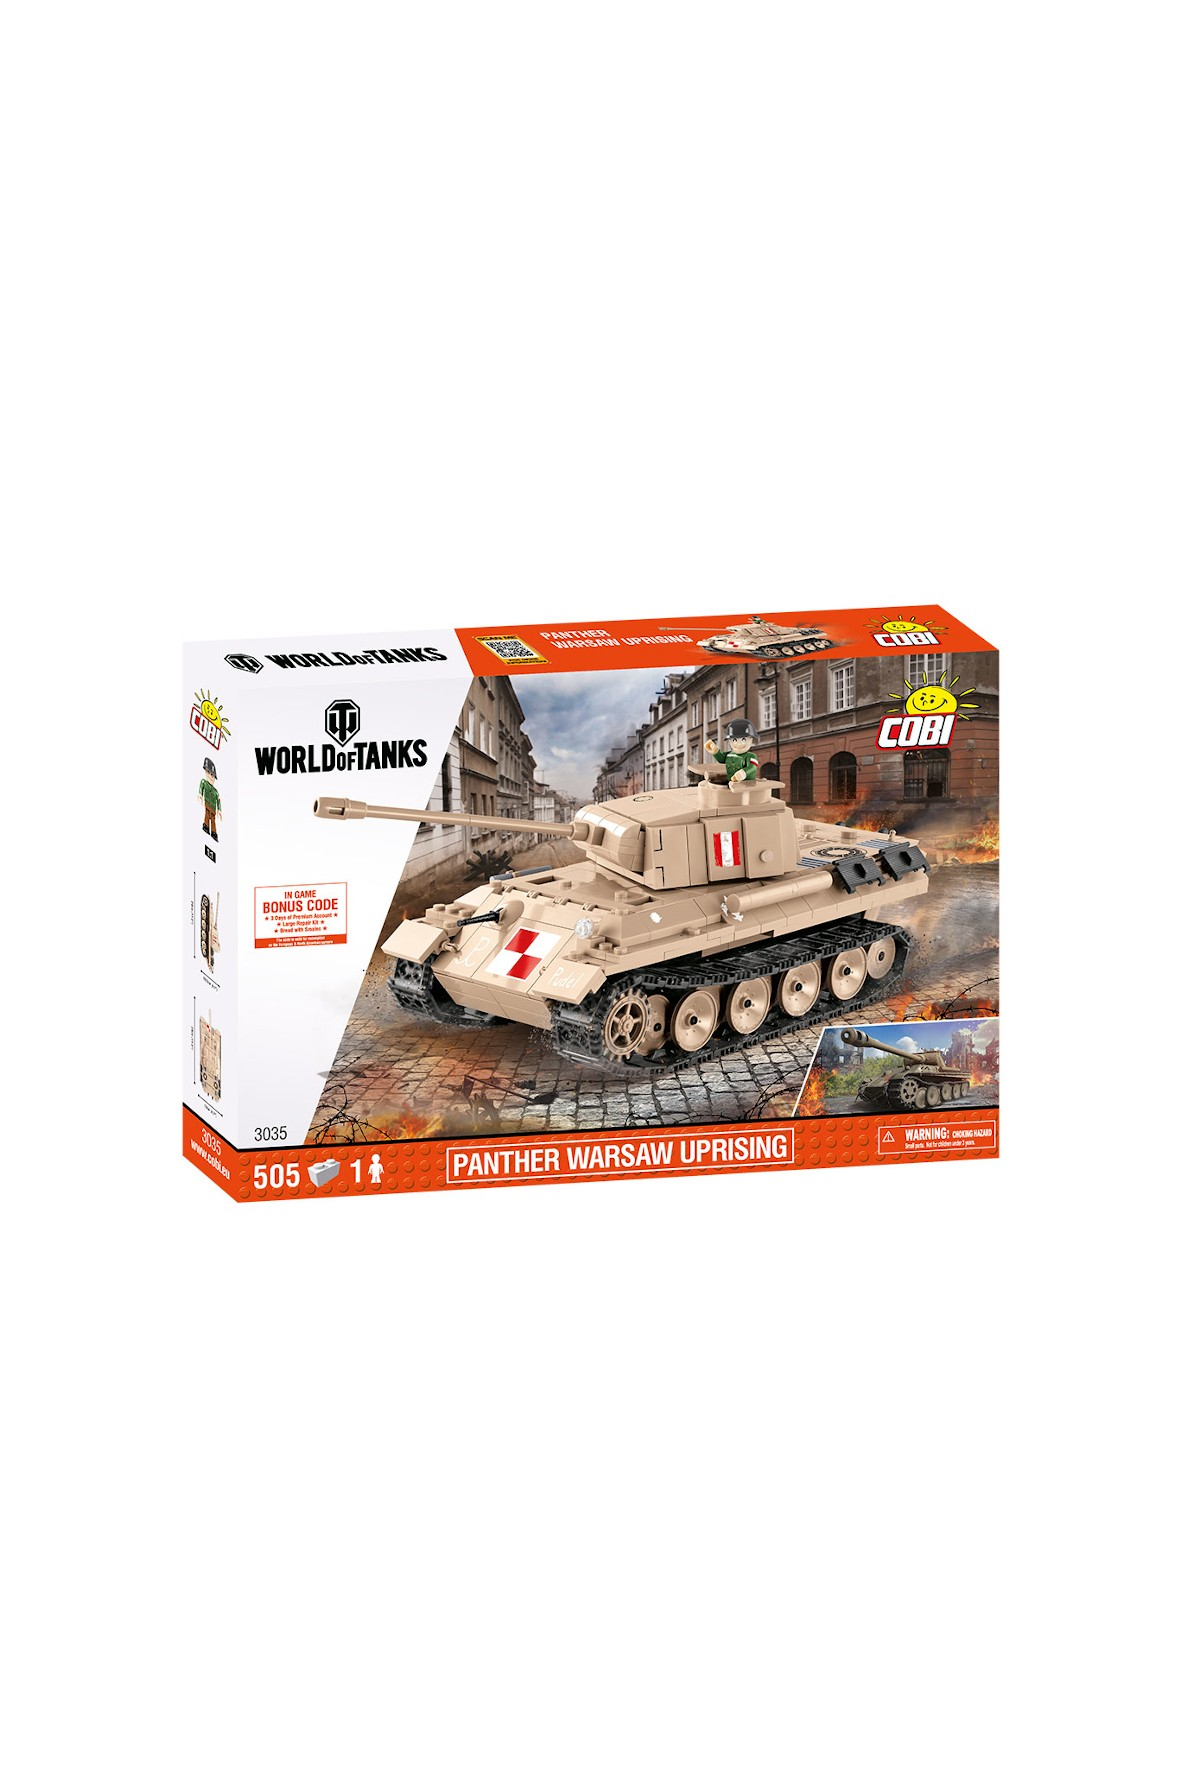 Klocki Cobi Small Army WOT PZKPFW V Panter Warsaw Up 506el